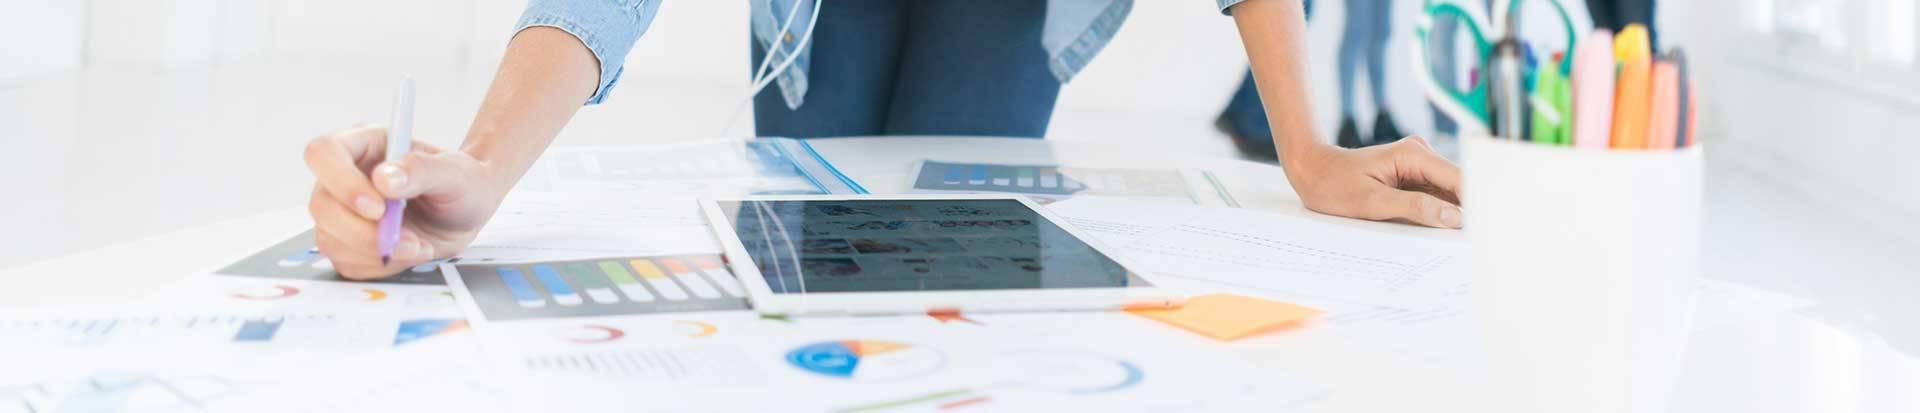 Exceptional Website & Mobile Design Services